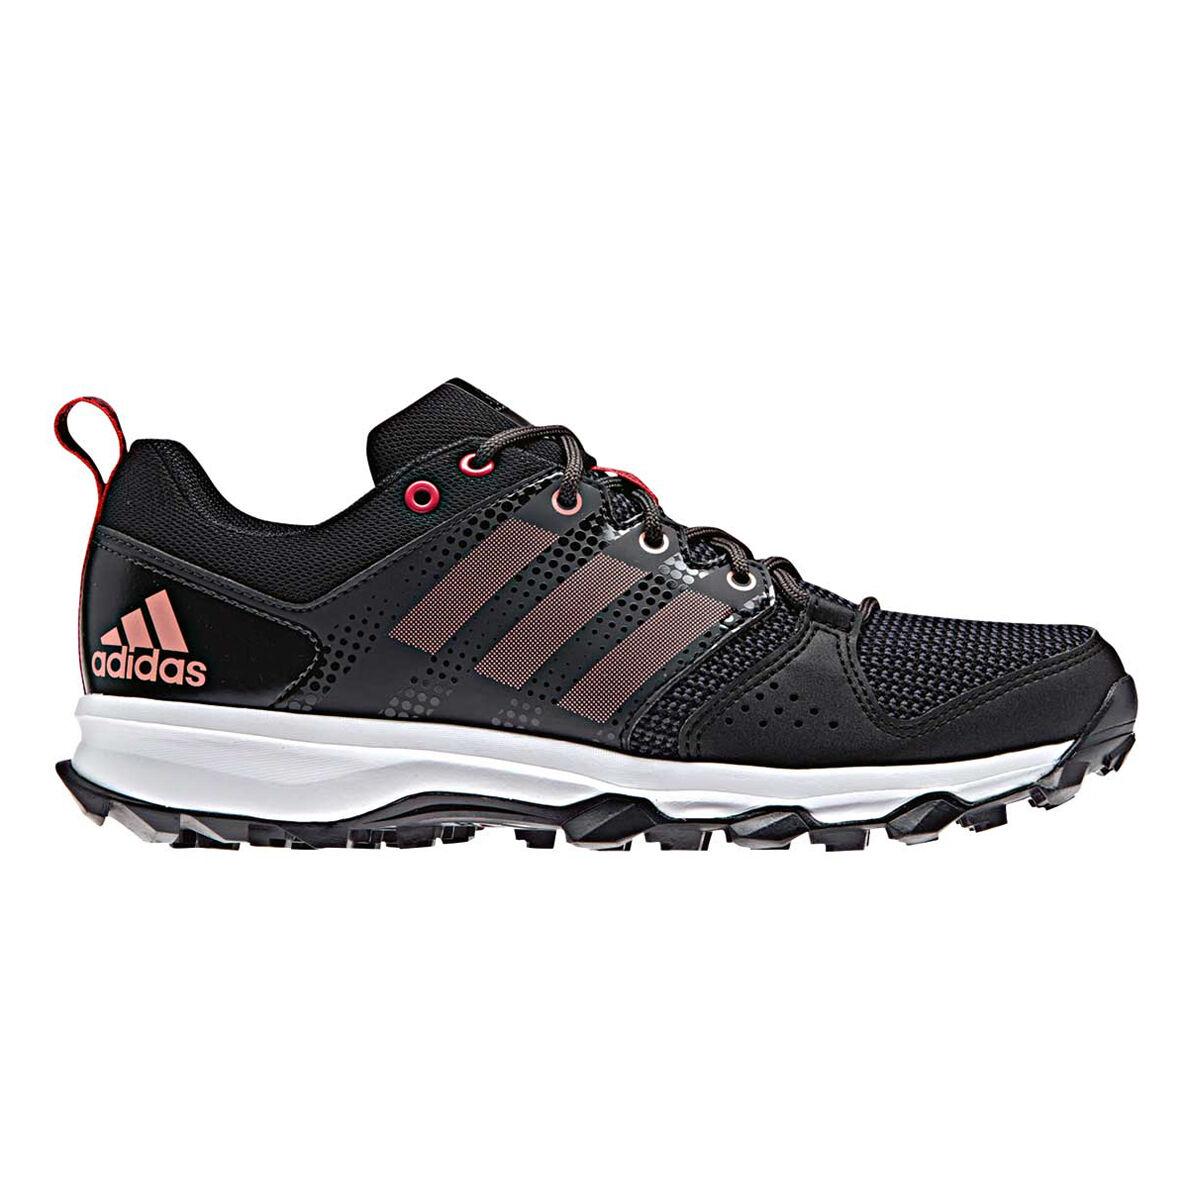 adidas Galaxy Womens Trail Running Shoes